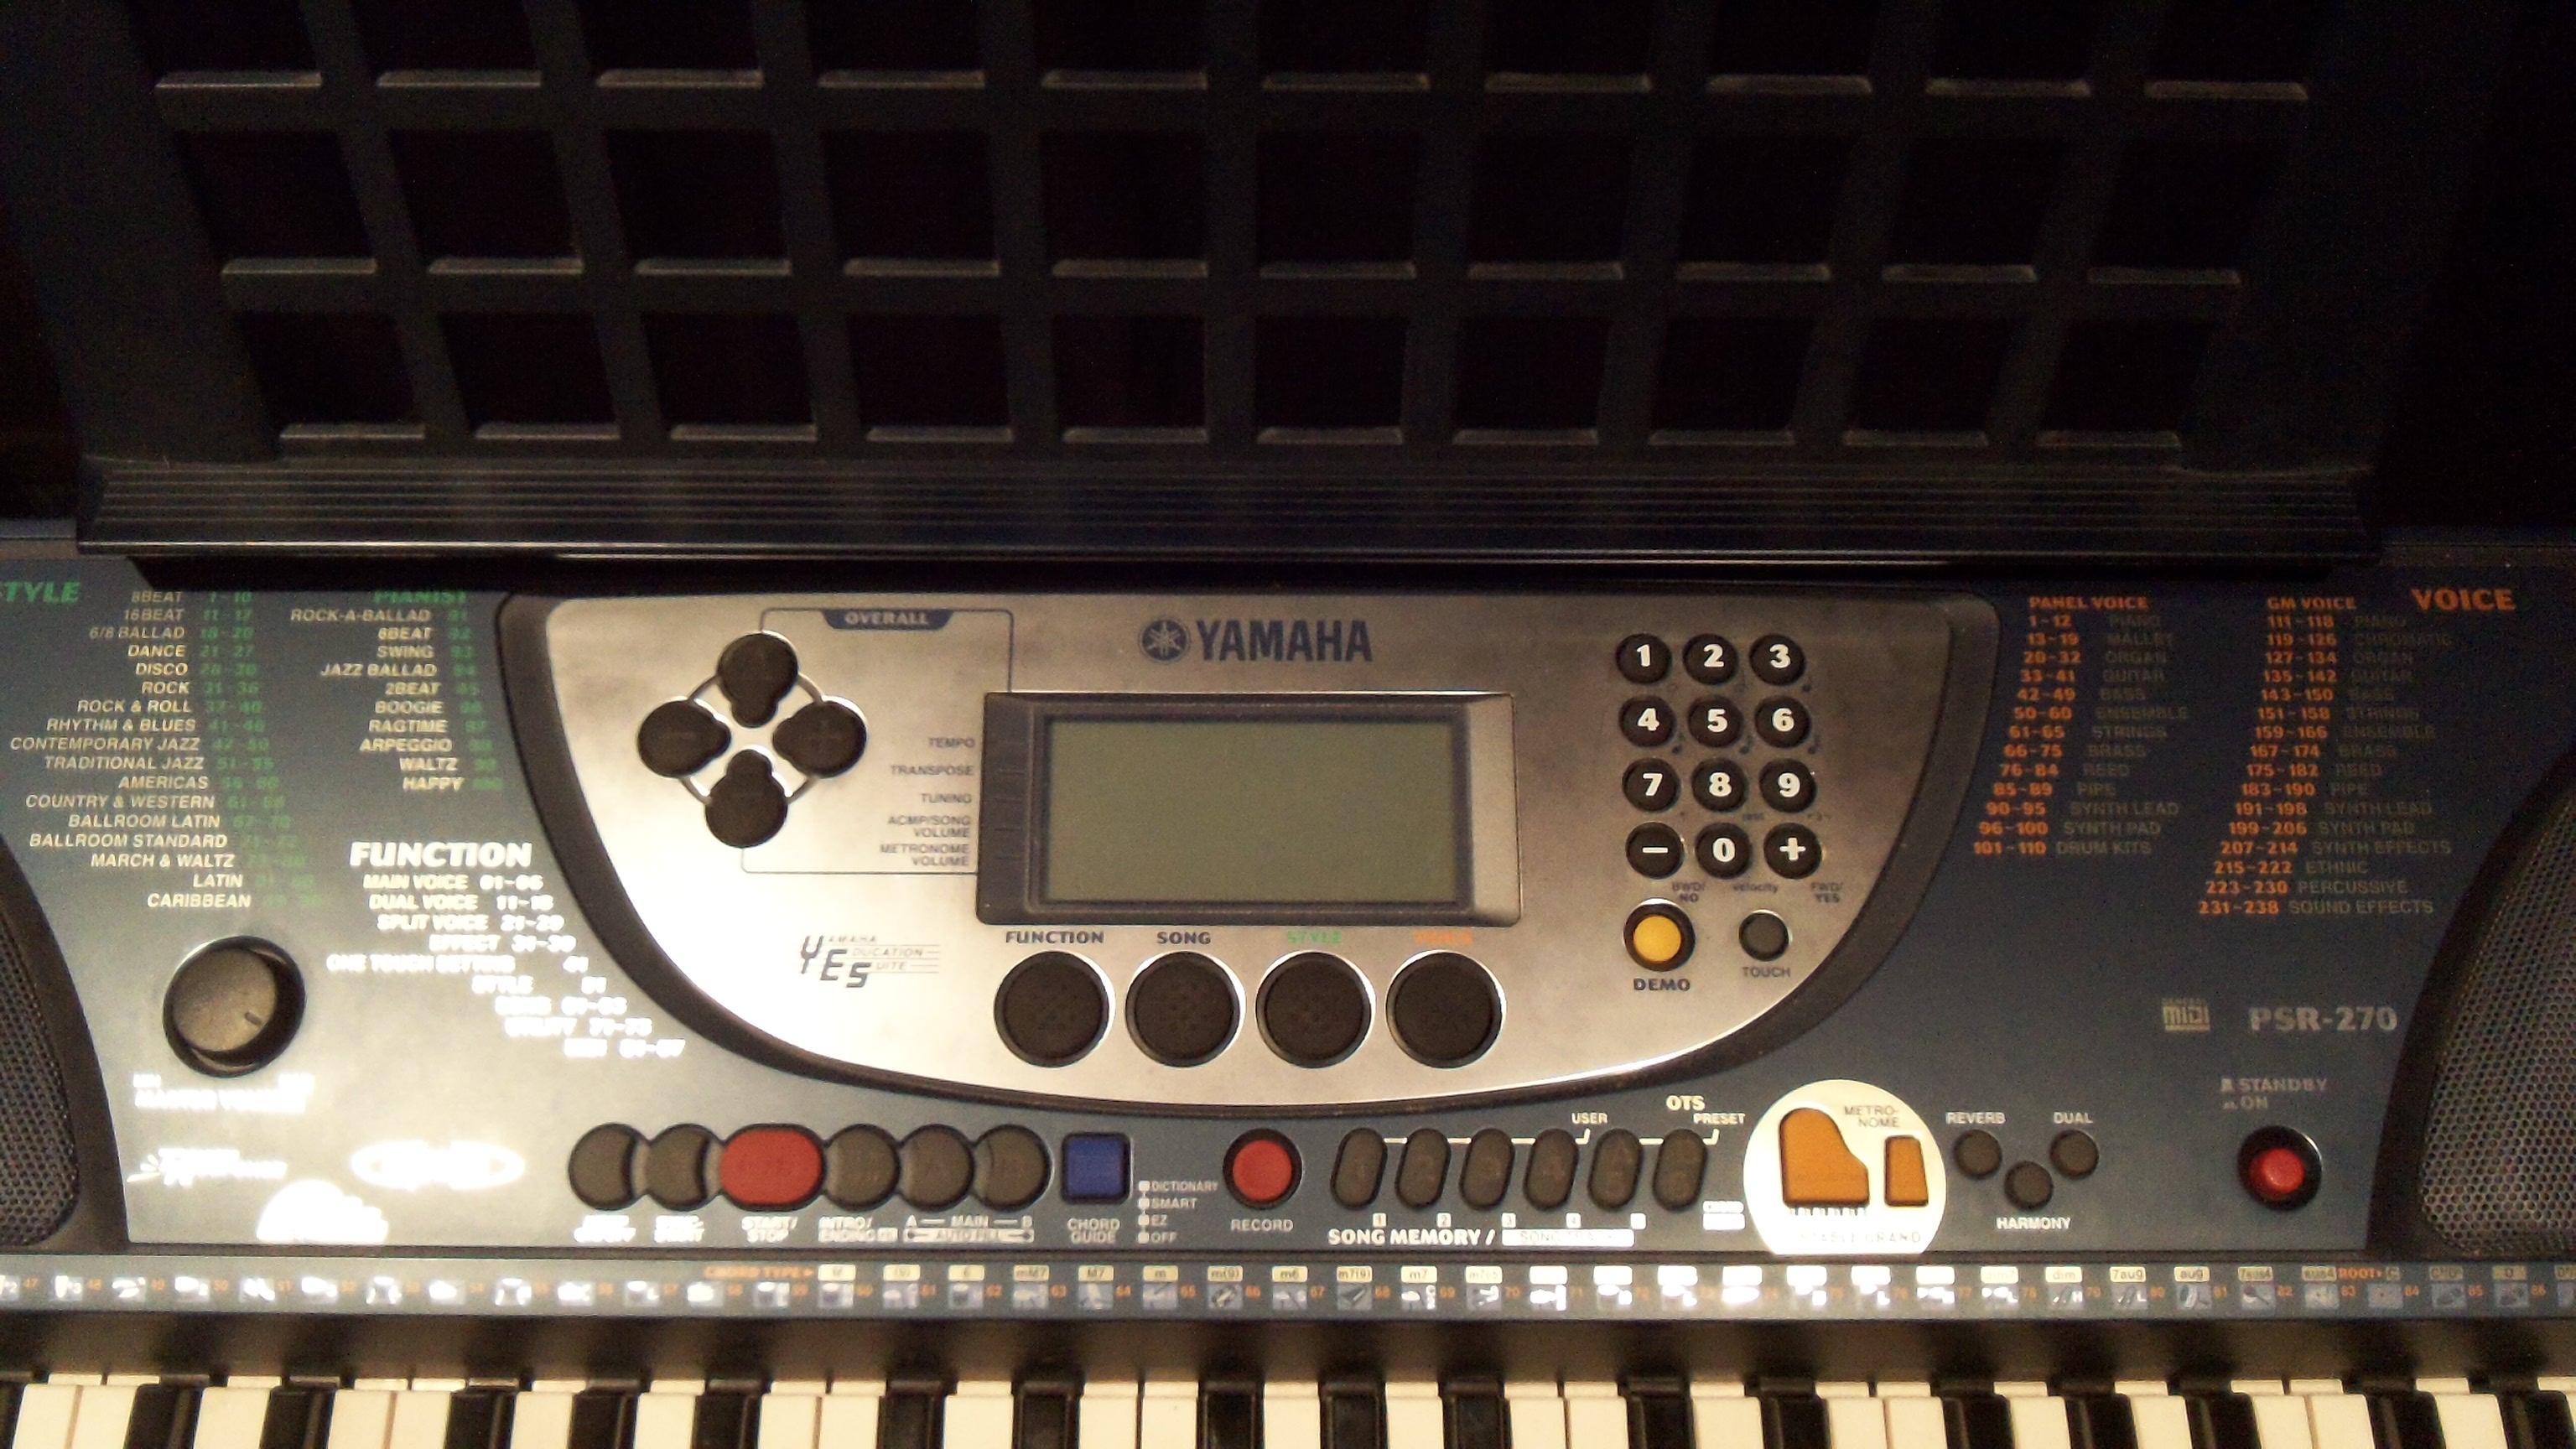 yamaha psr 270 image 1078554 audiofanzine rh en audiofanzine com yamaha psr-270 specifications yamaha psr-270 keyboard manual